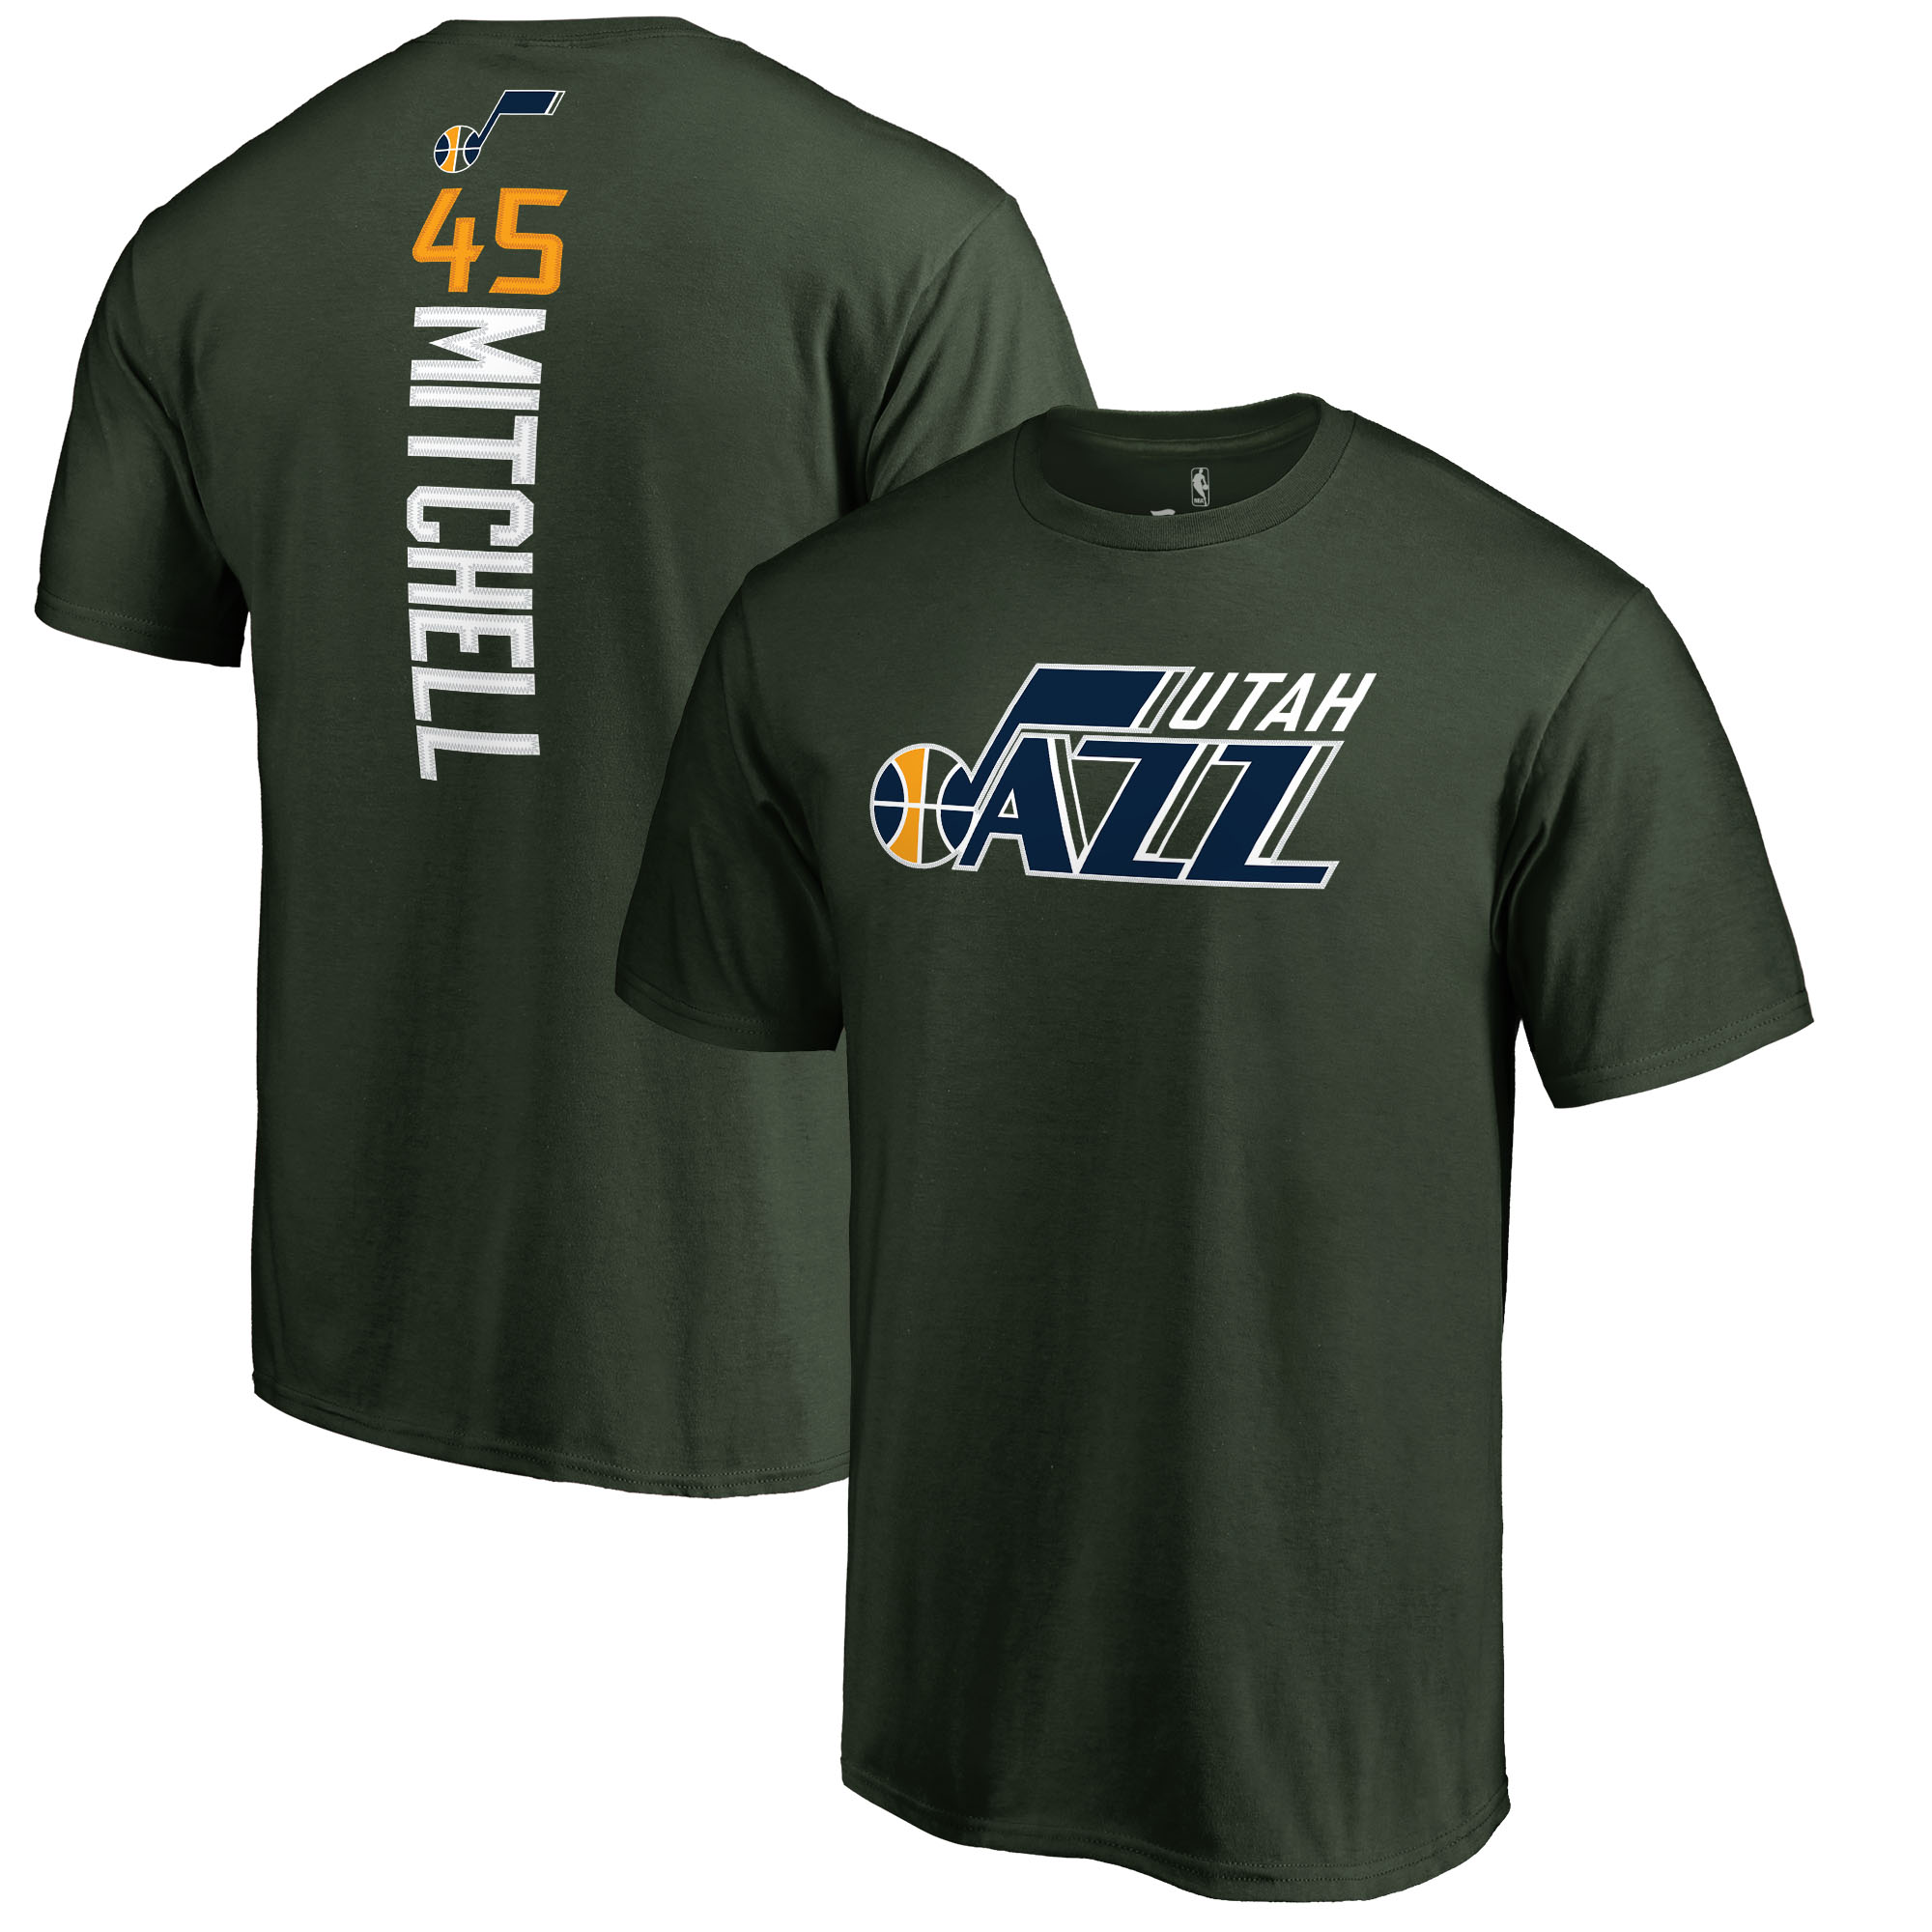 Donovan Mitchell Utah Jazz Fanatics Branded Team Backer Name & Number T-Shirt - Green